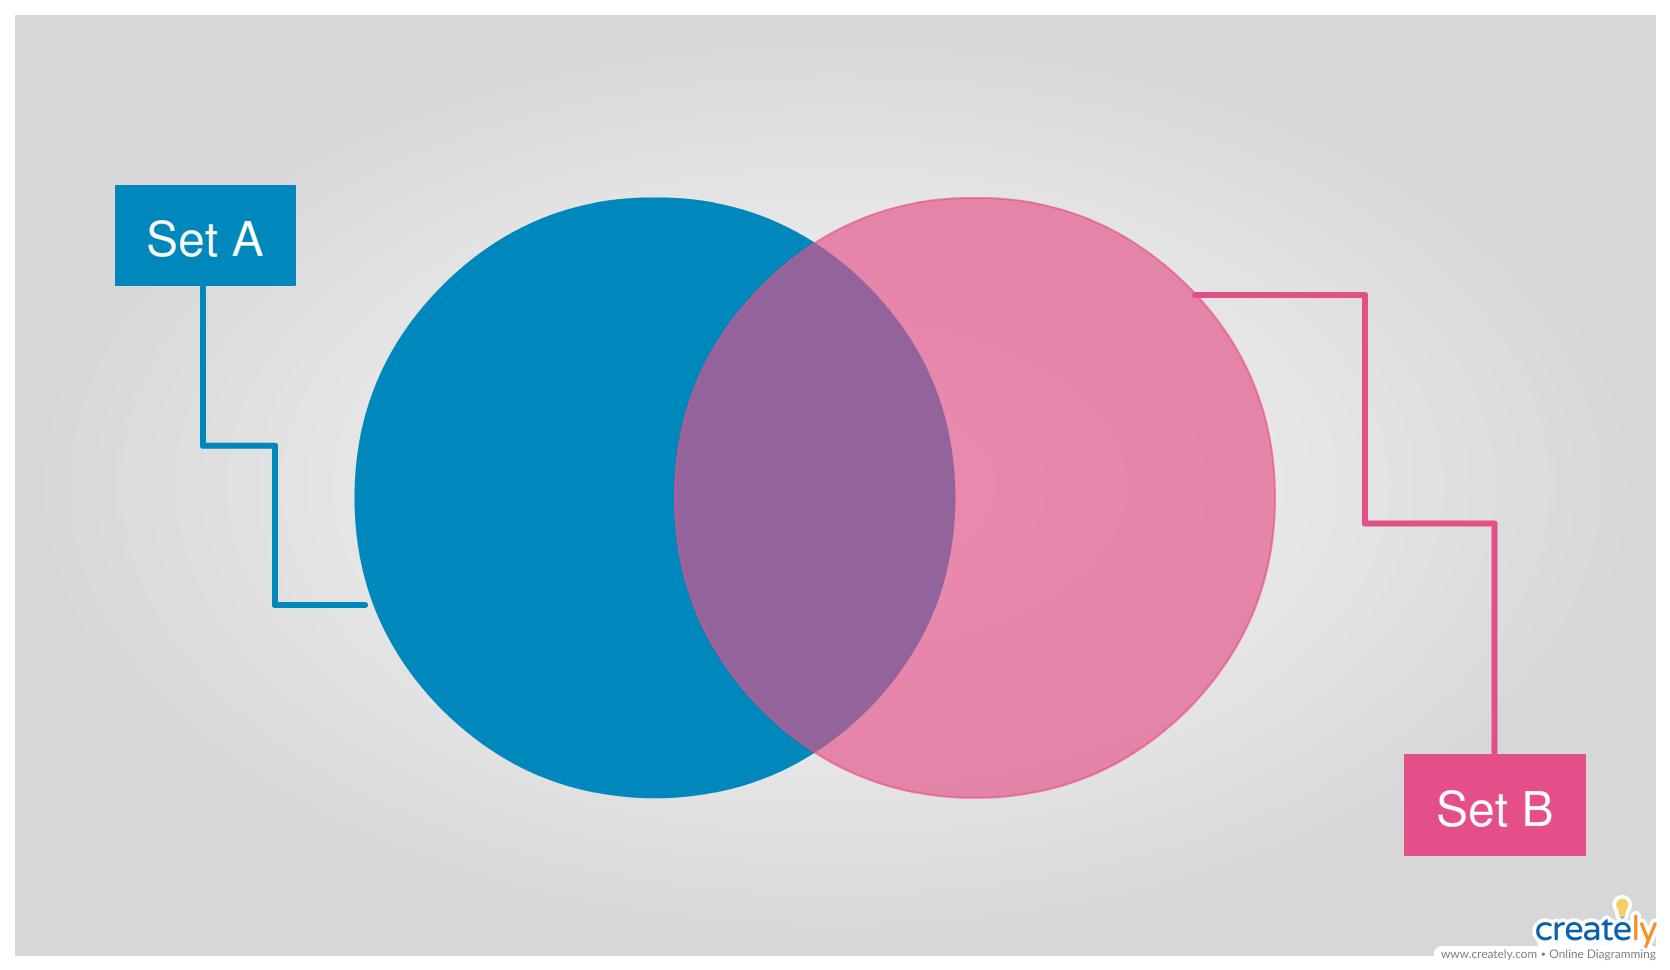 Plantilla De Diagrama De Venn En Blanco Venn Diagram Template Venn Diagram Blank Venn Diagram